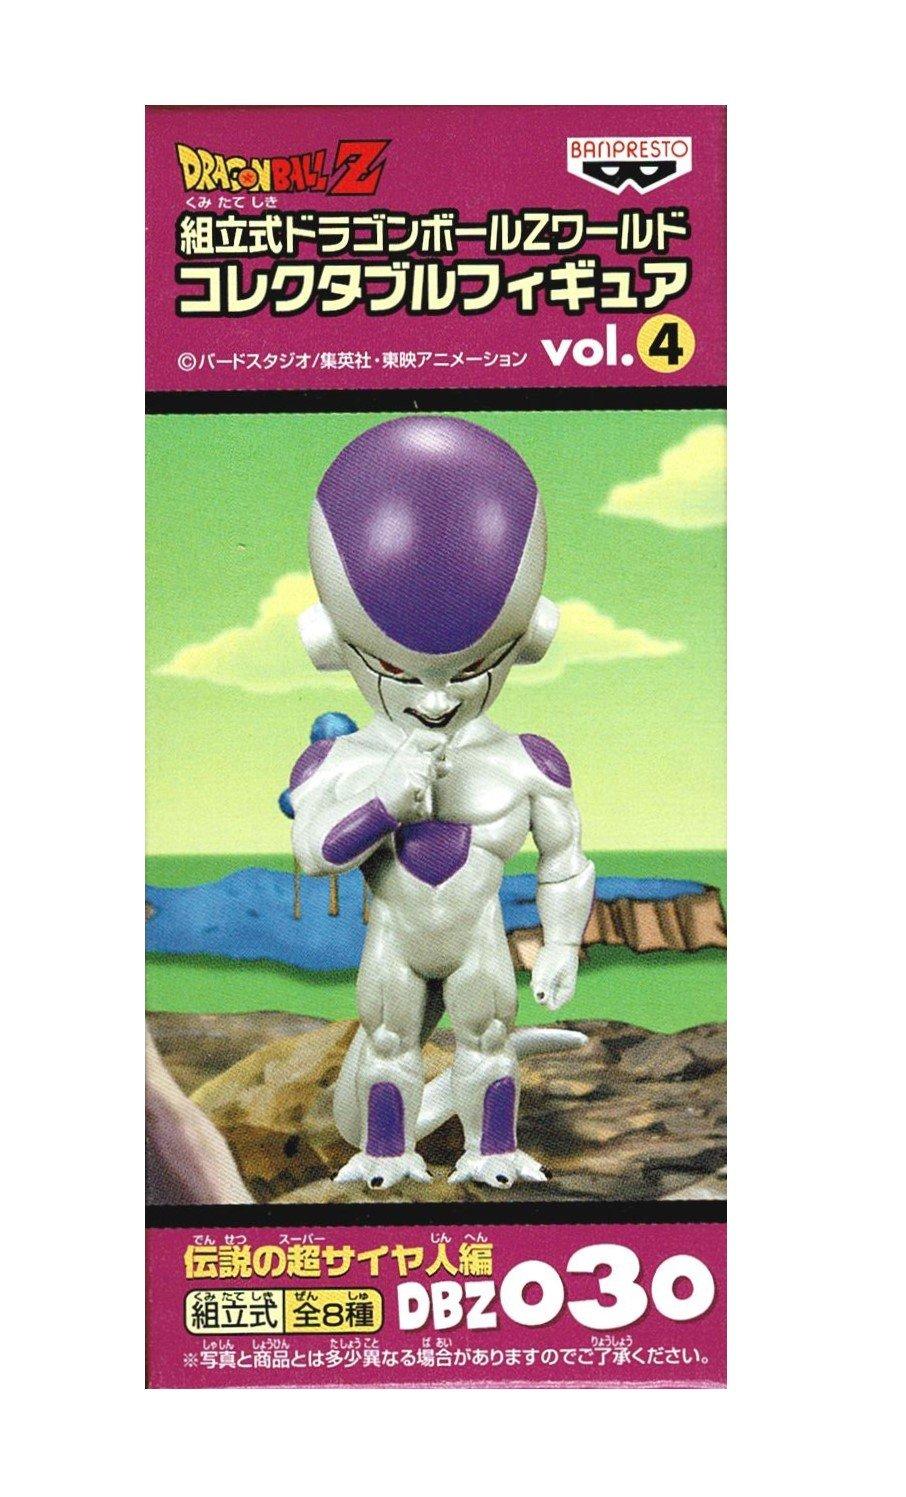 increíbles descuentos DBZ030 single item Super Saiyan Hen freezer vol.4 of of of legendary Dragon Ball Z Dragon Ball Z prefabricated World Collectable Figure (japan import)  mejor moda